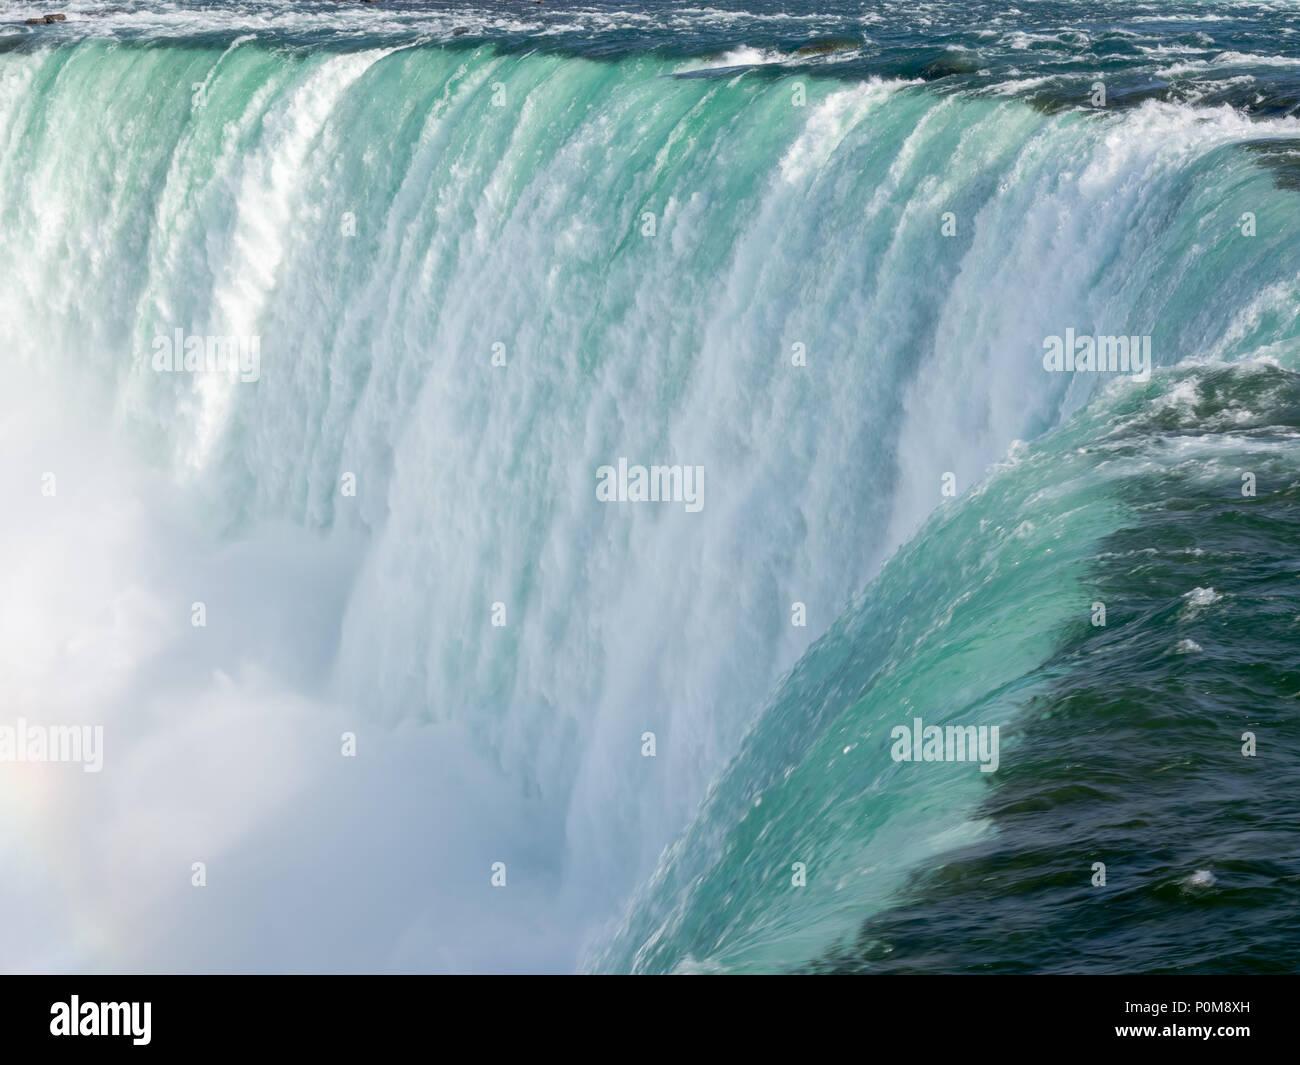 Horseshoe falls as seen from Niagara Falls, Ontario, Canada side. - Stock Image